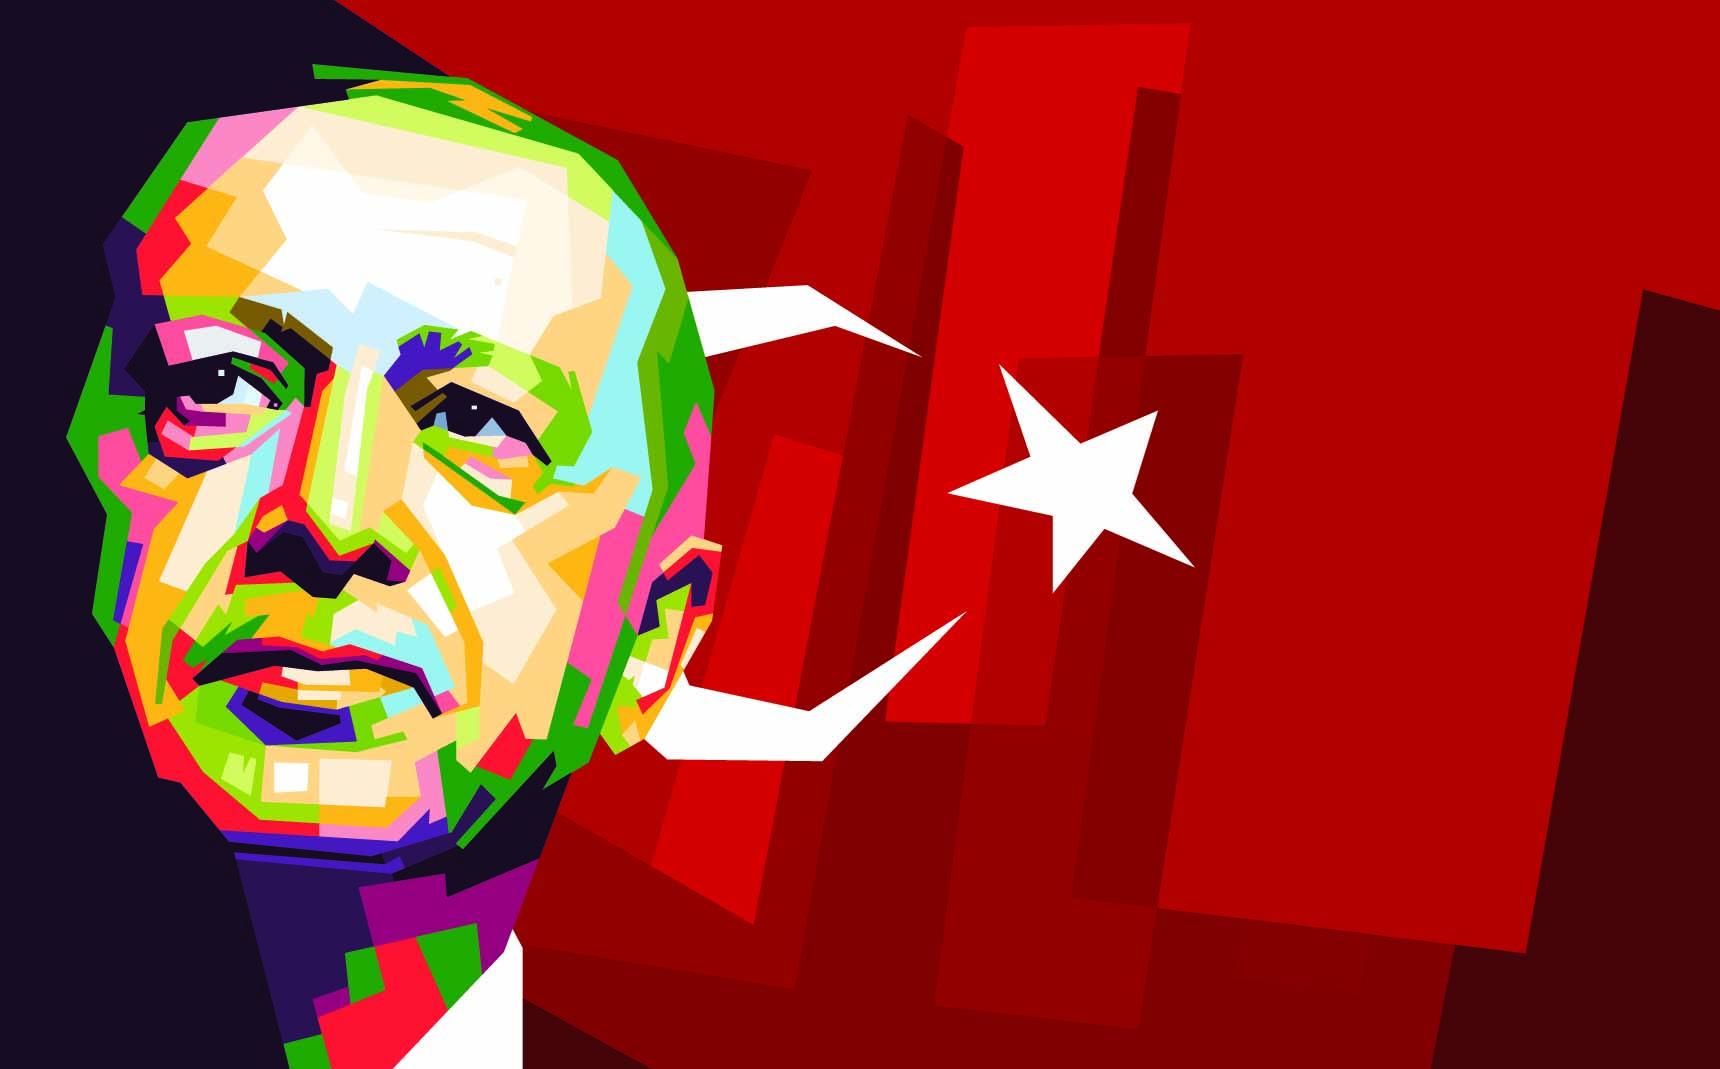 rise of Turkey